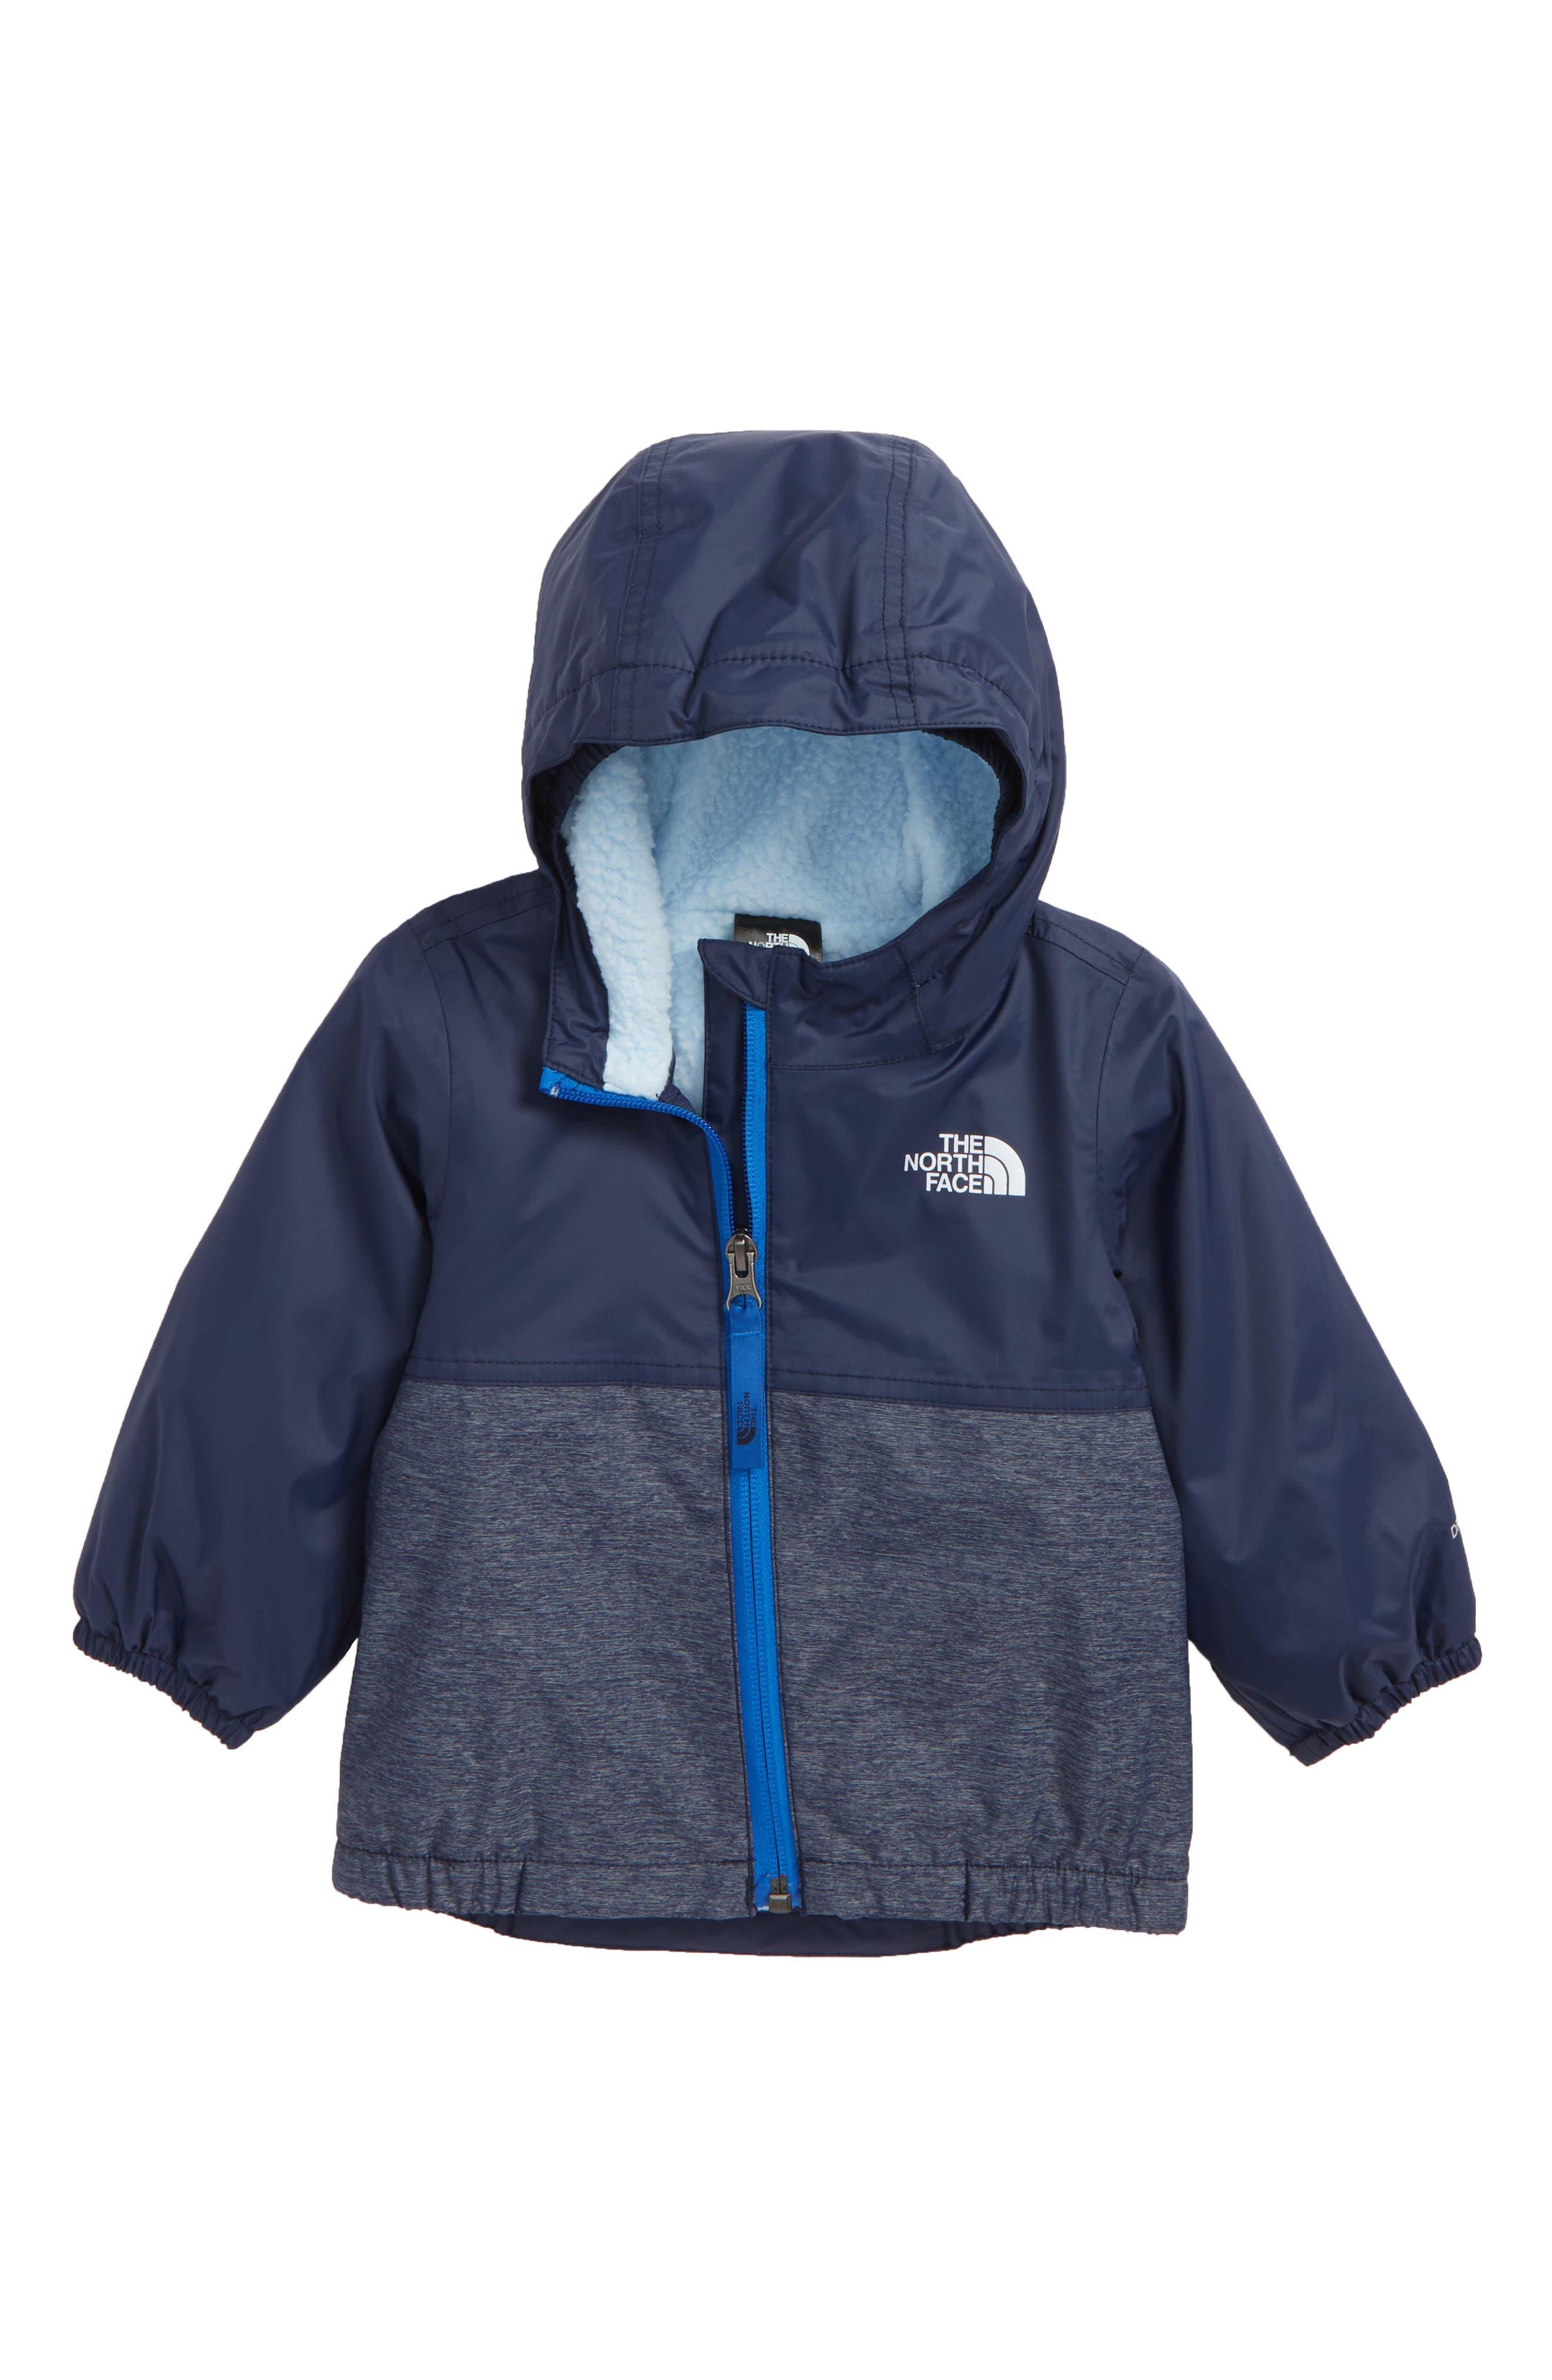 Warm Storm Hooded Waterproof Jacket,                         Main,                         color, COSMIC BLUE/ BLUE HEATHER